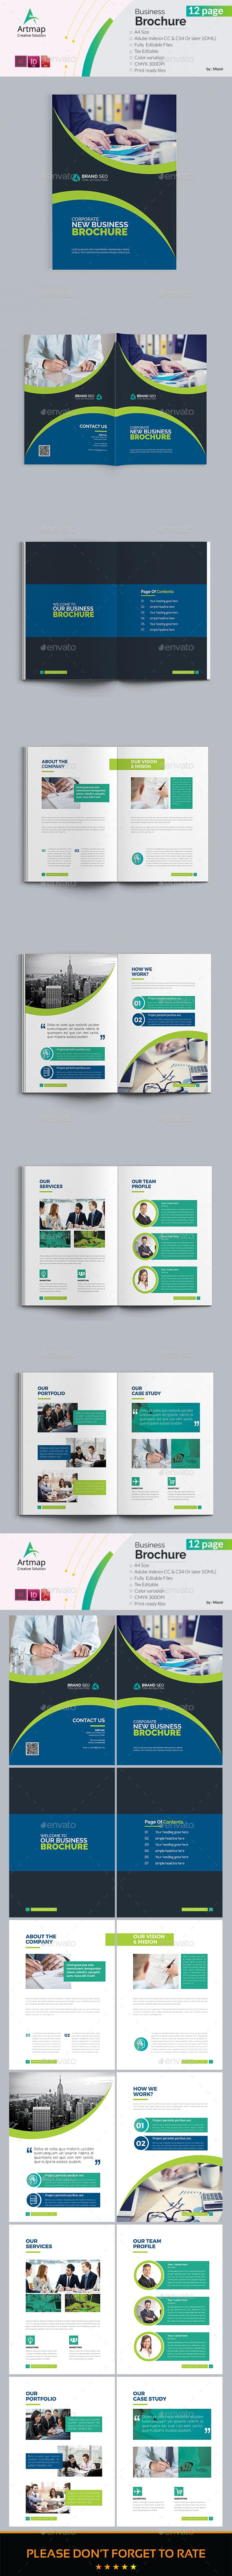 Bundle Brochure 2 in 1